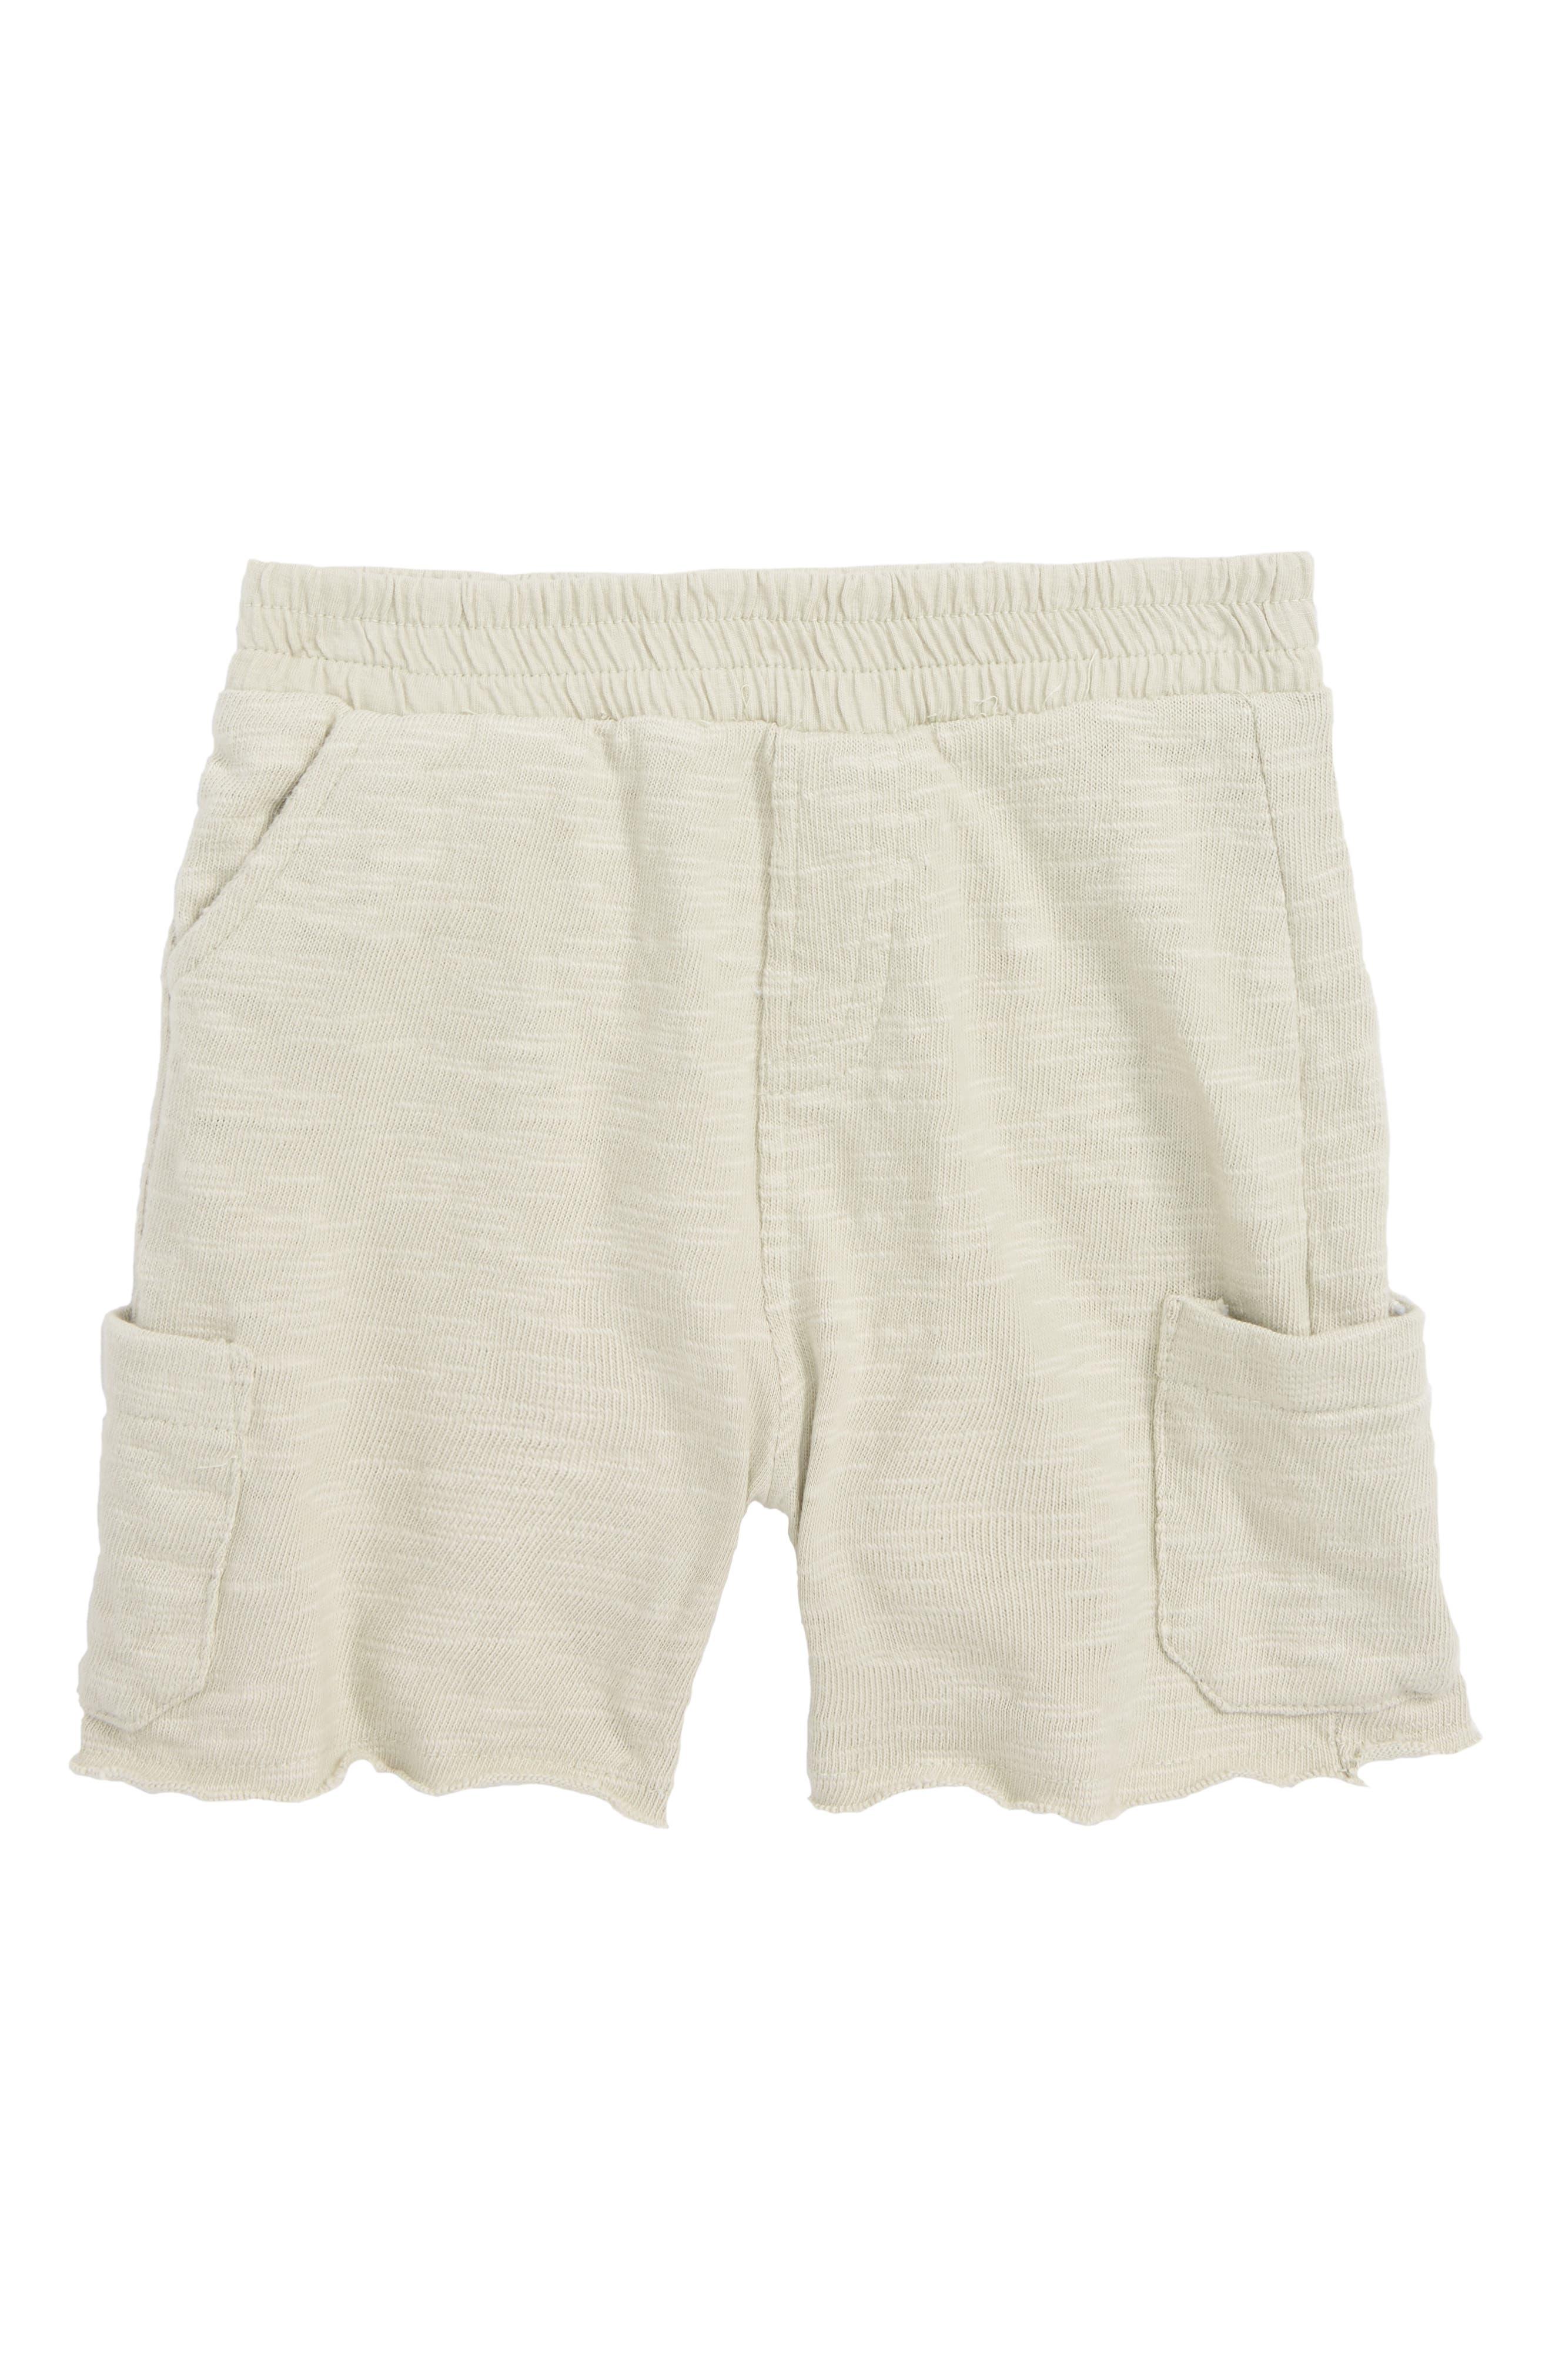 Peek Asher Knit Cargo Shorts (Baby)